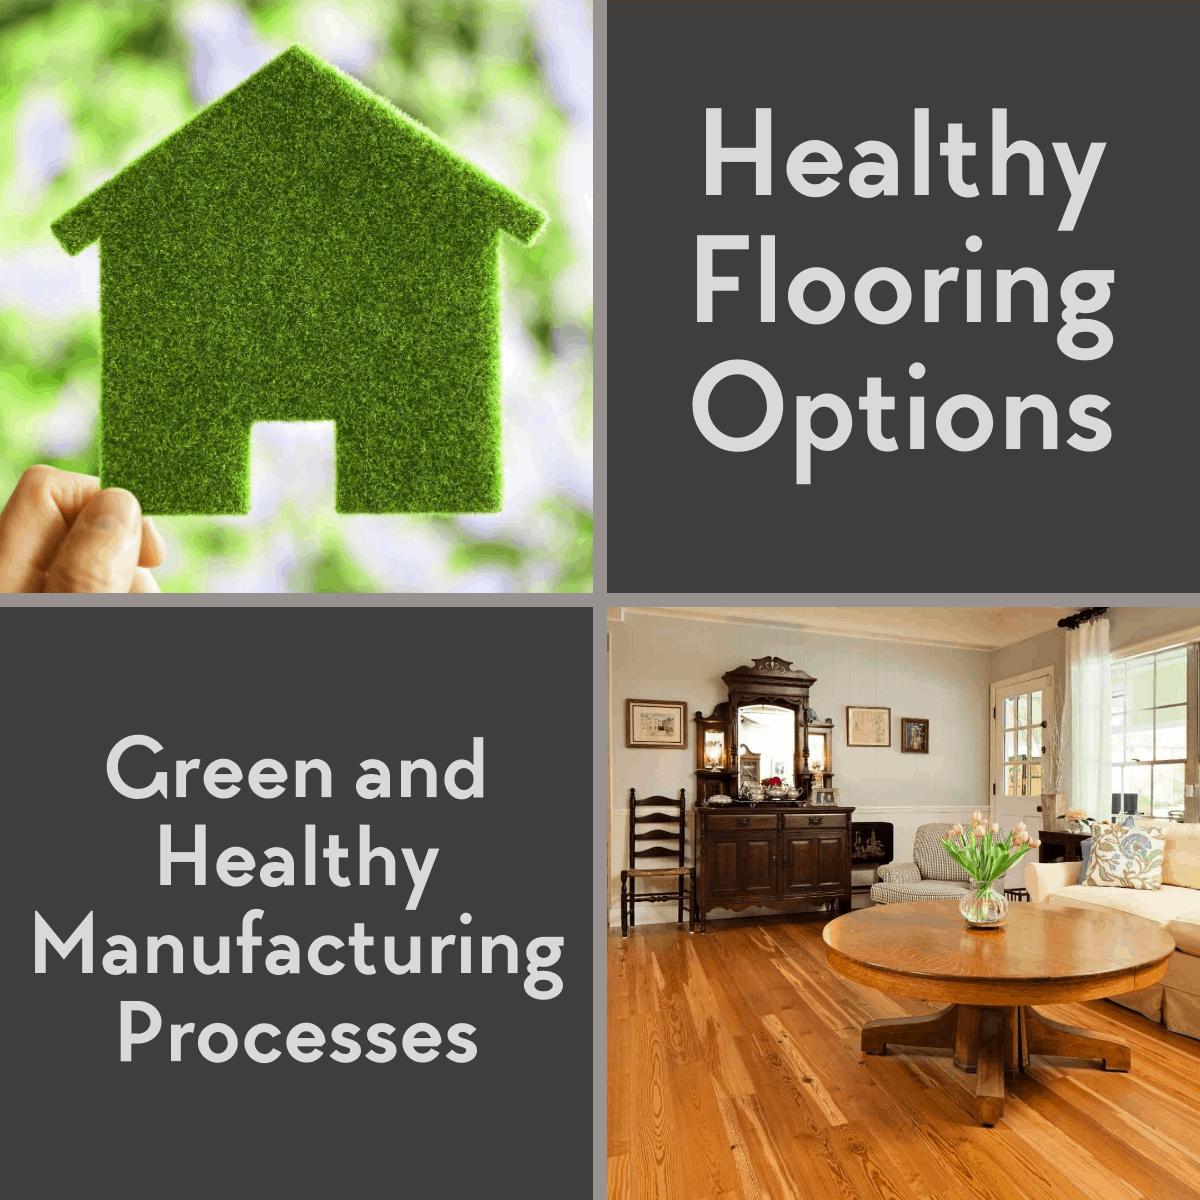 Healthy Flooring Options